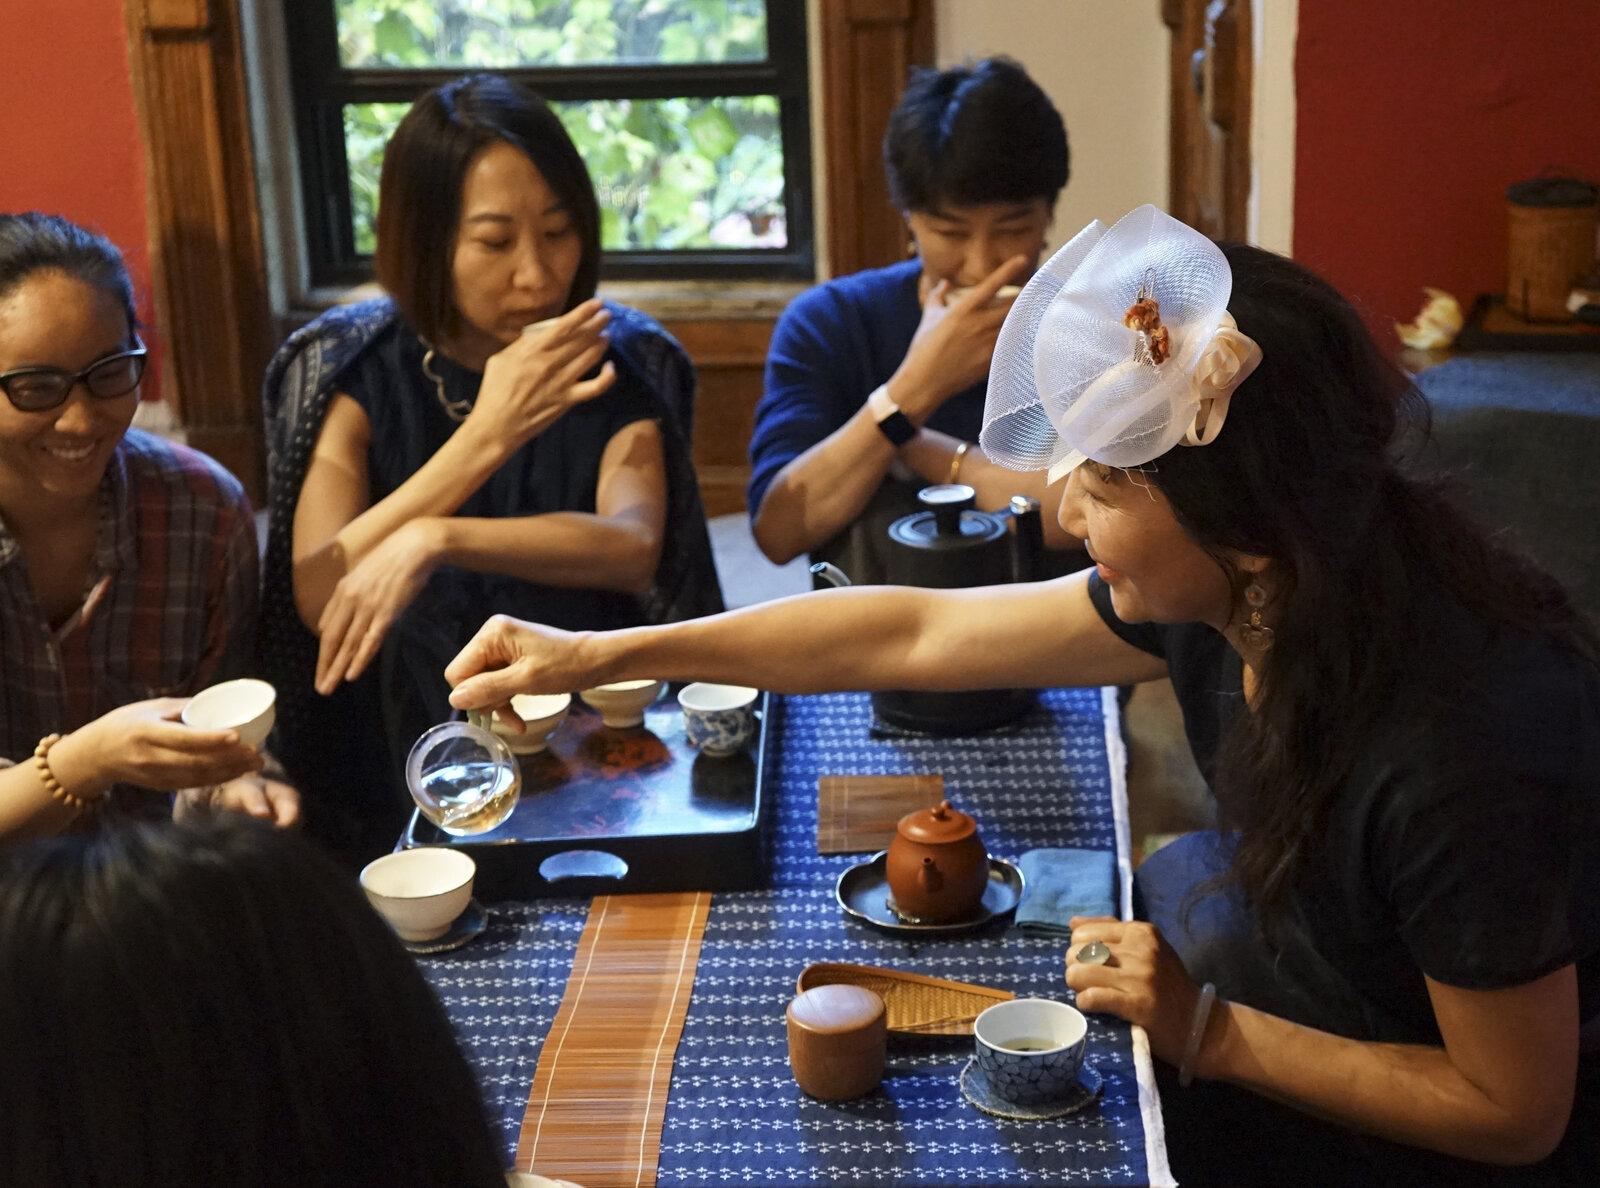 Ikebana and Tea Ceremony at Present , photo by Yilan Wang, Courtesy Fou Gallery.